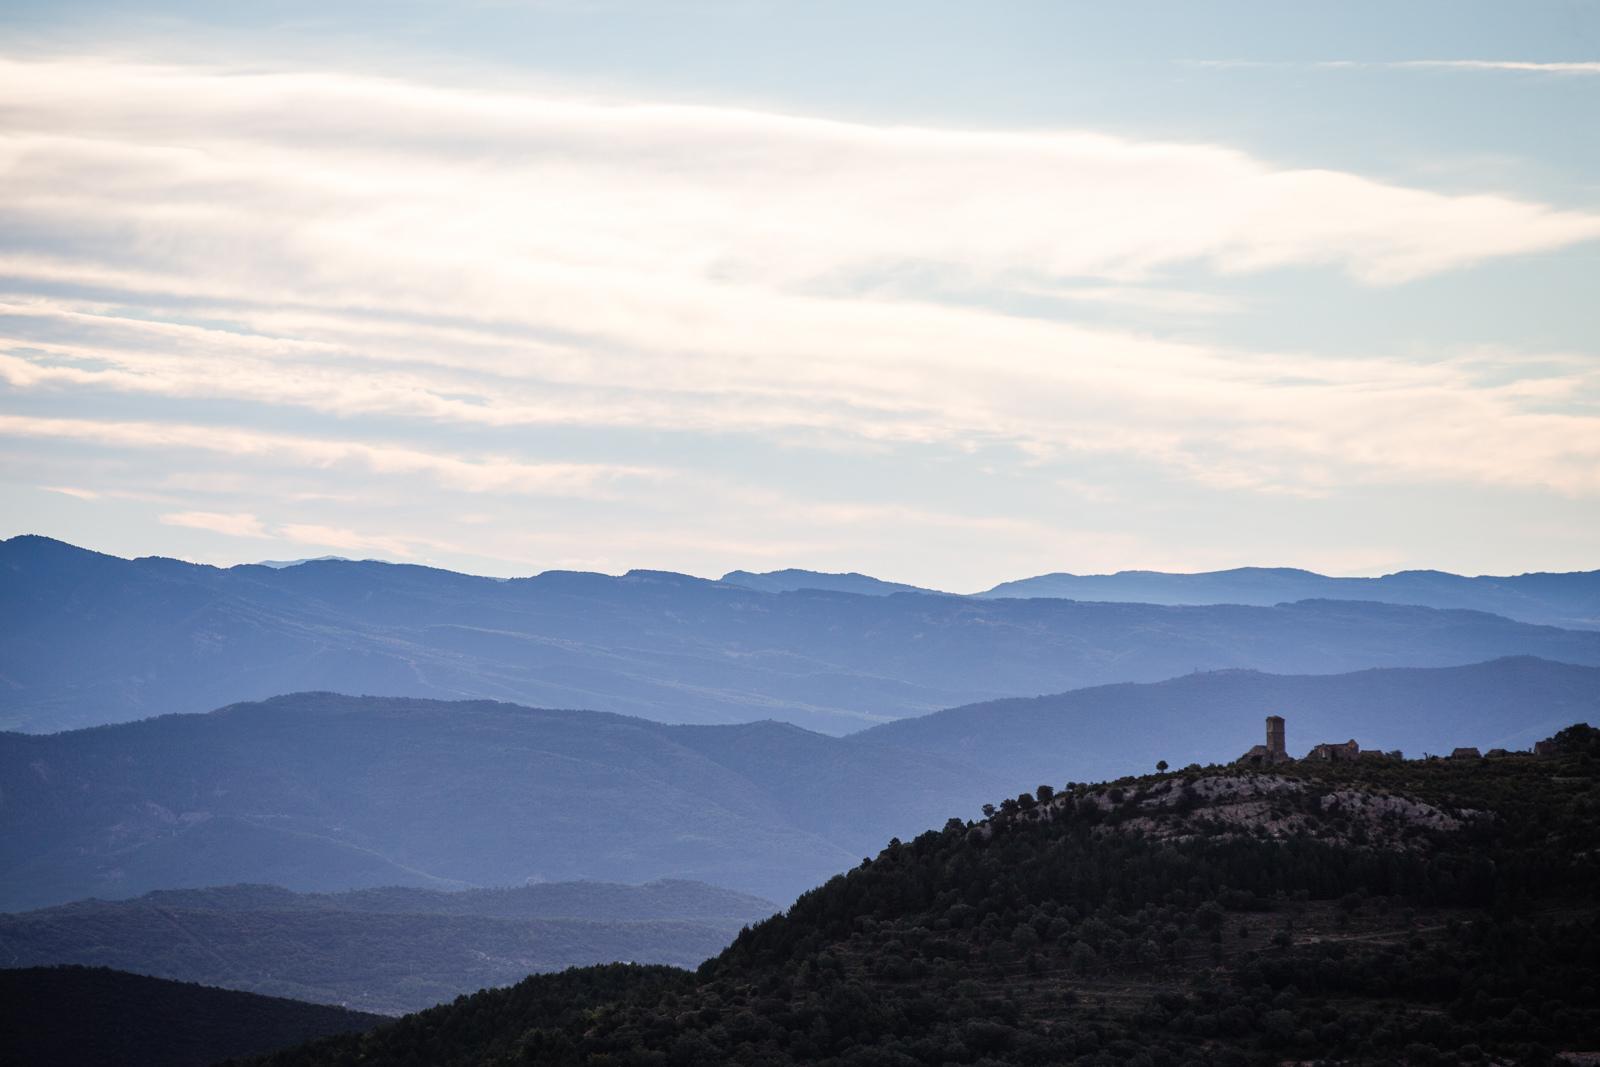 The view this morning. EWS round 7 Ainsa Spain. Photo by Matt Wragg.